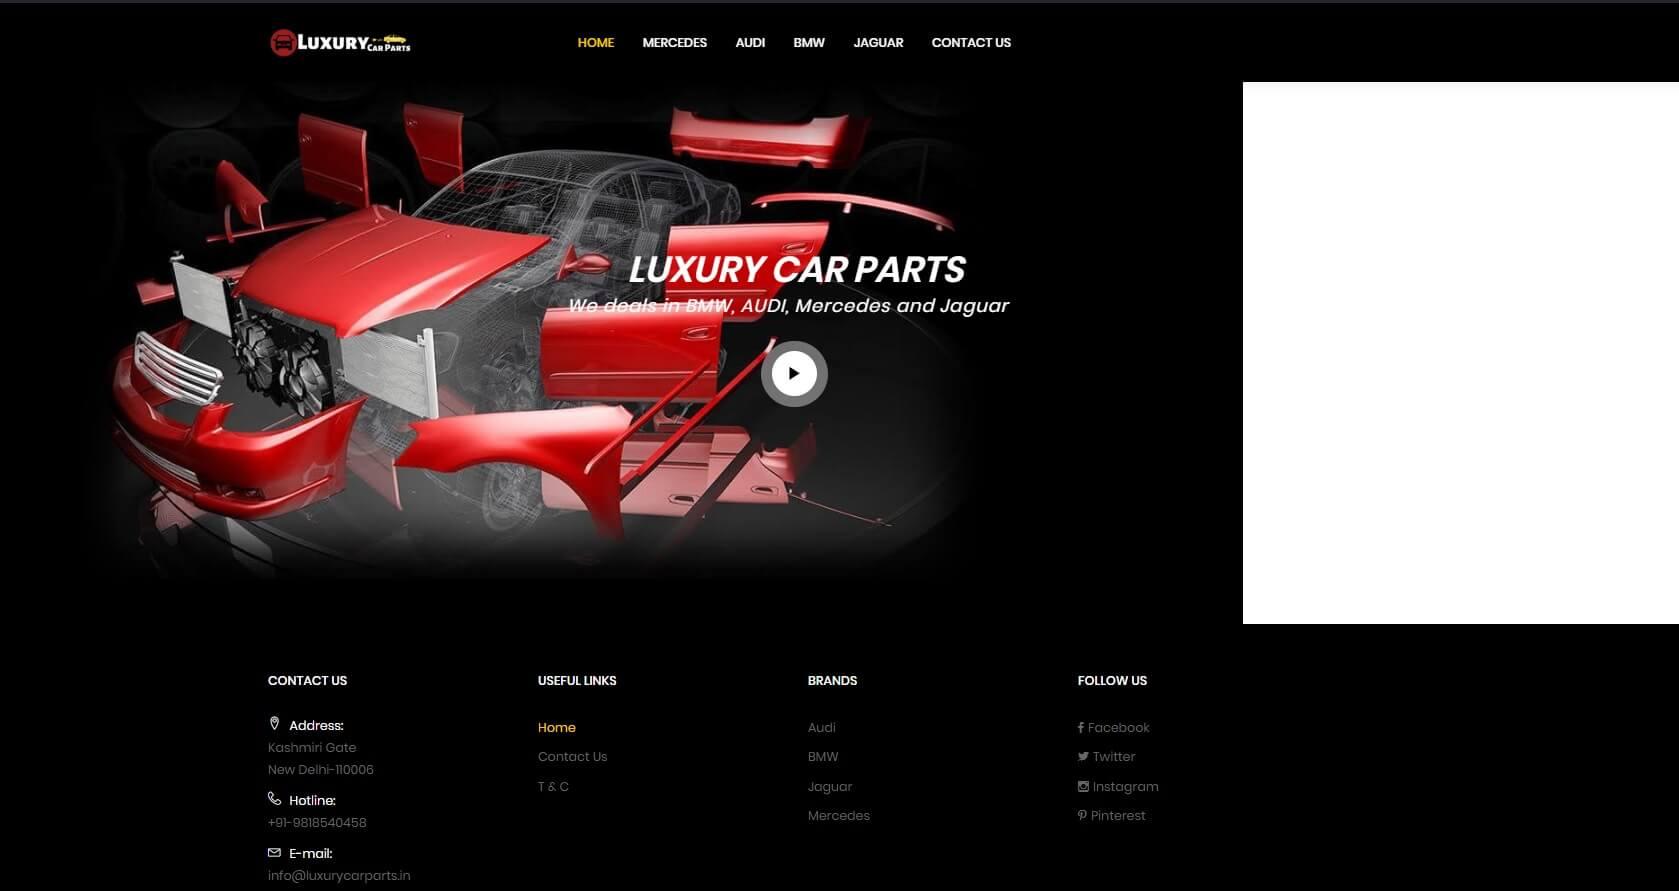 Luxury Car Parts